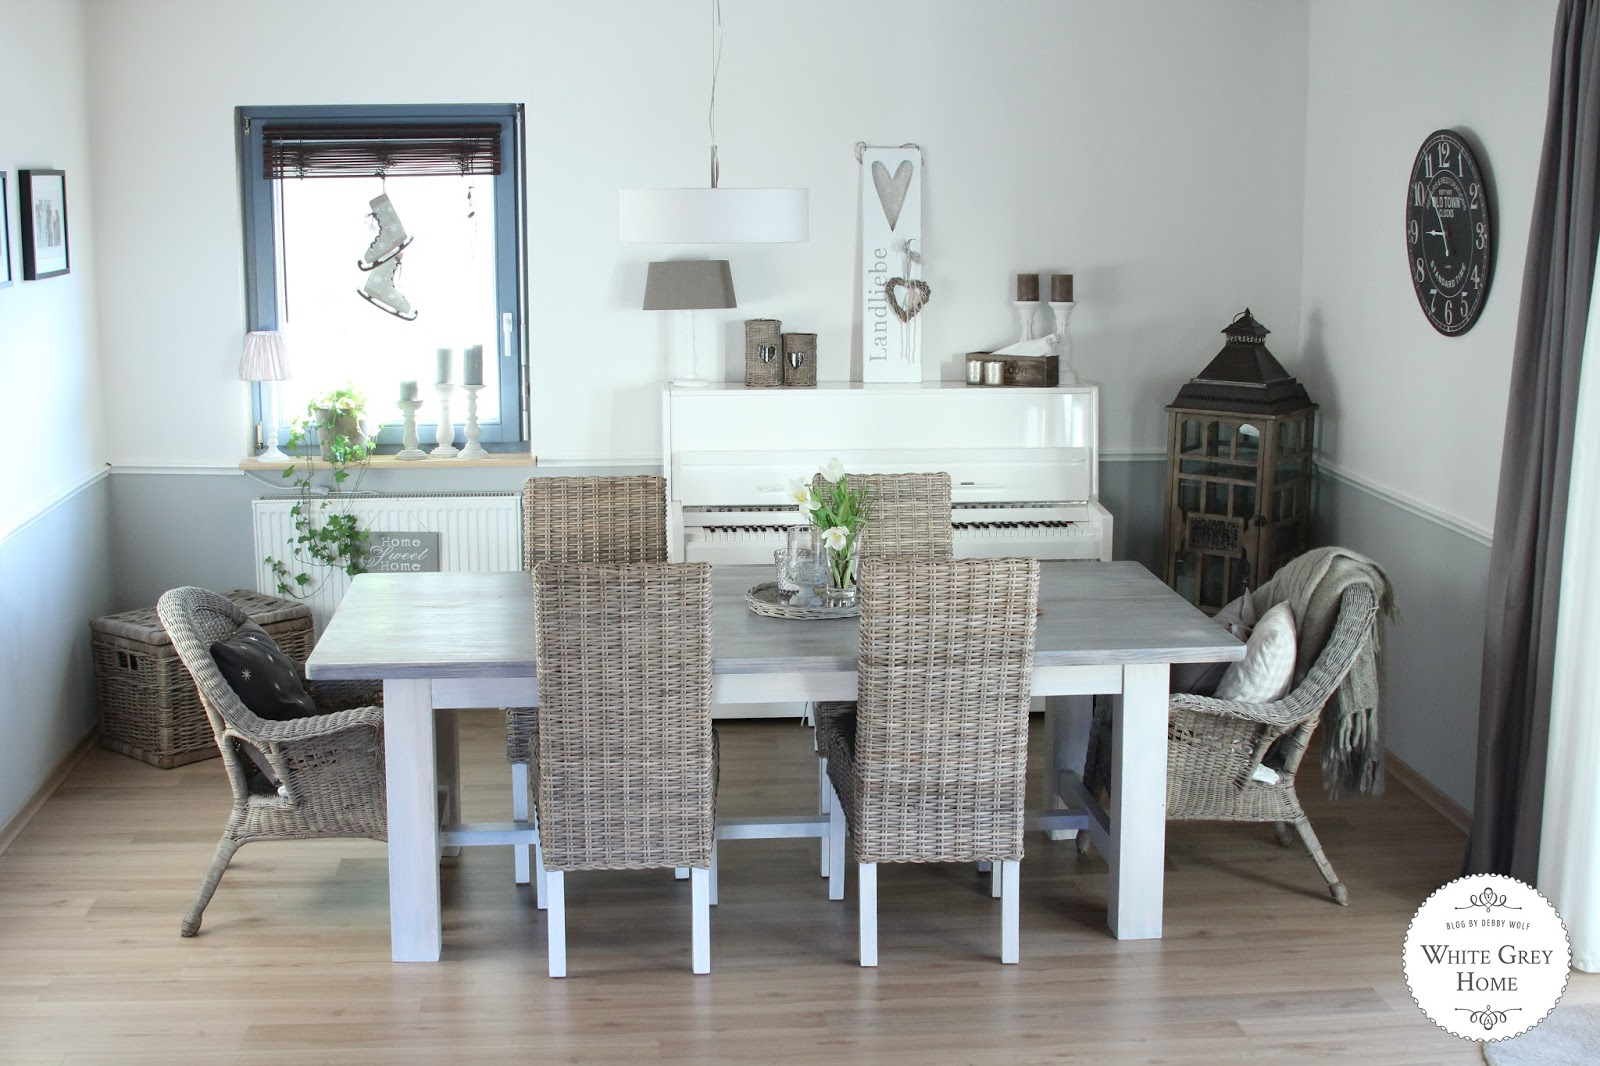 white grey home: Hometour Esszimmer